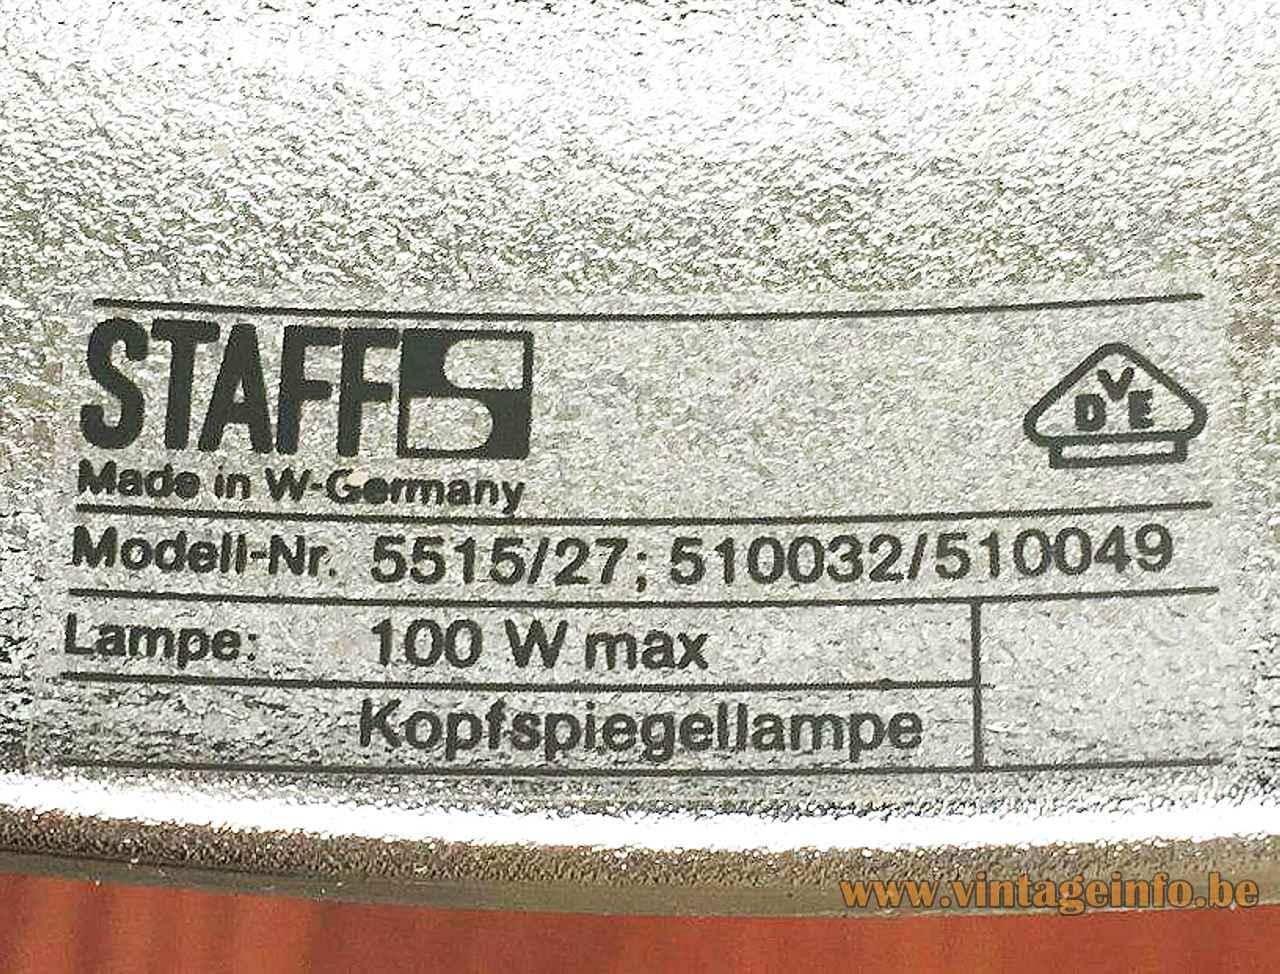 Staff pendant lamp 5515 label logo 5515/27 510032 510049 100 watt maximum 1970s 1980s Germany